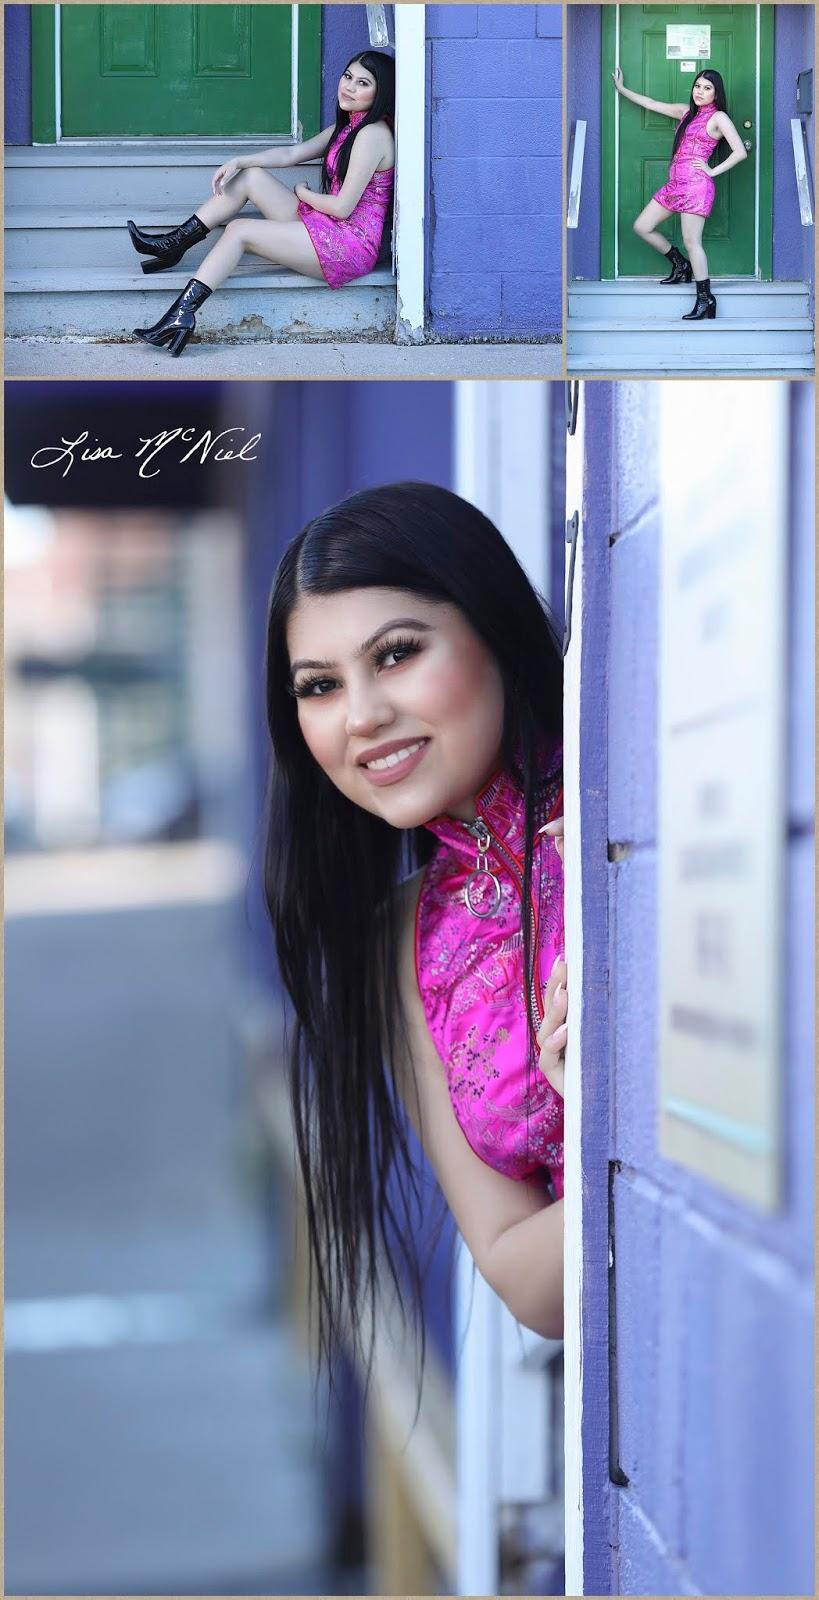 teen girl by purple wall